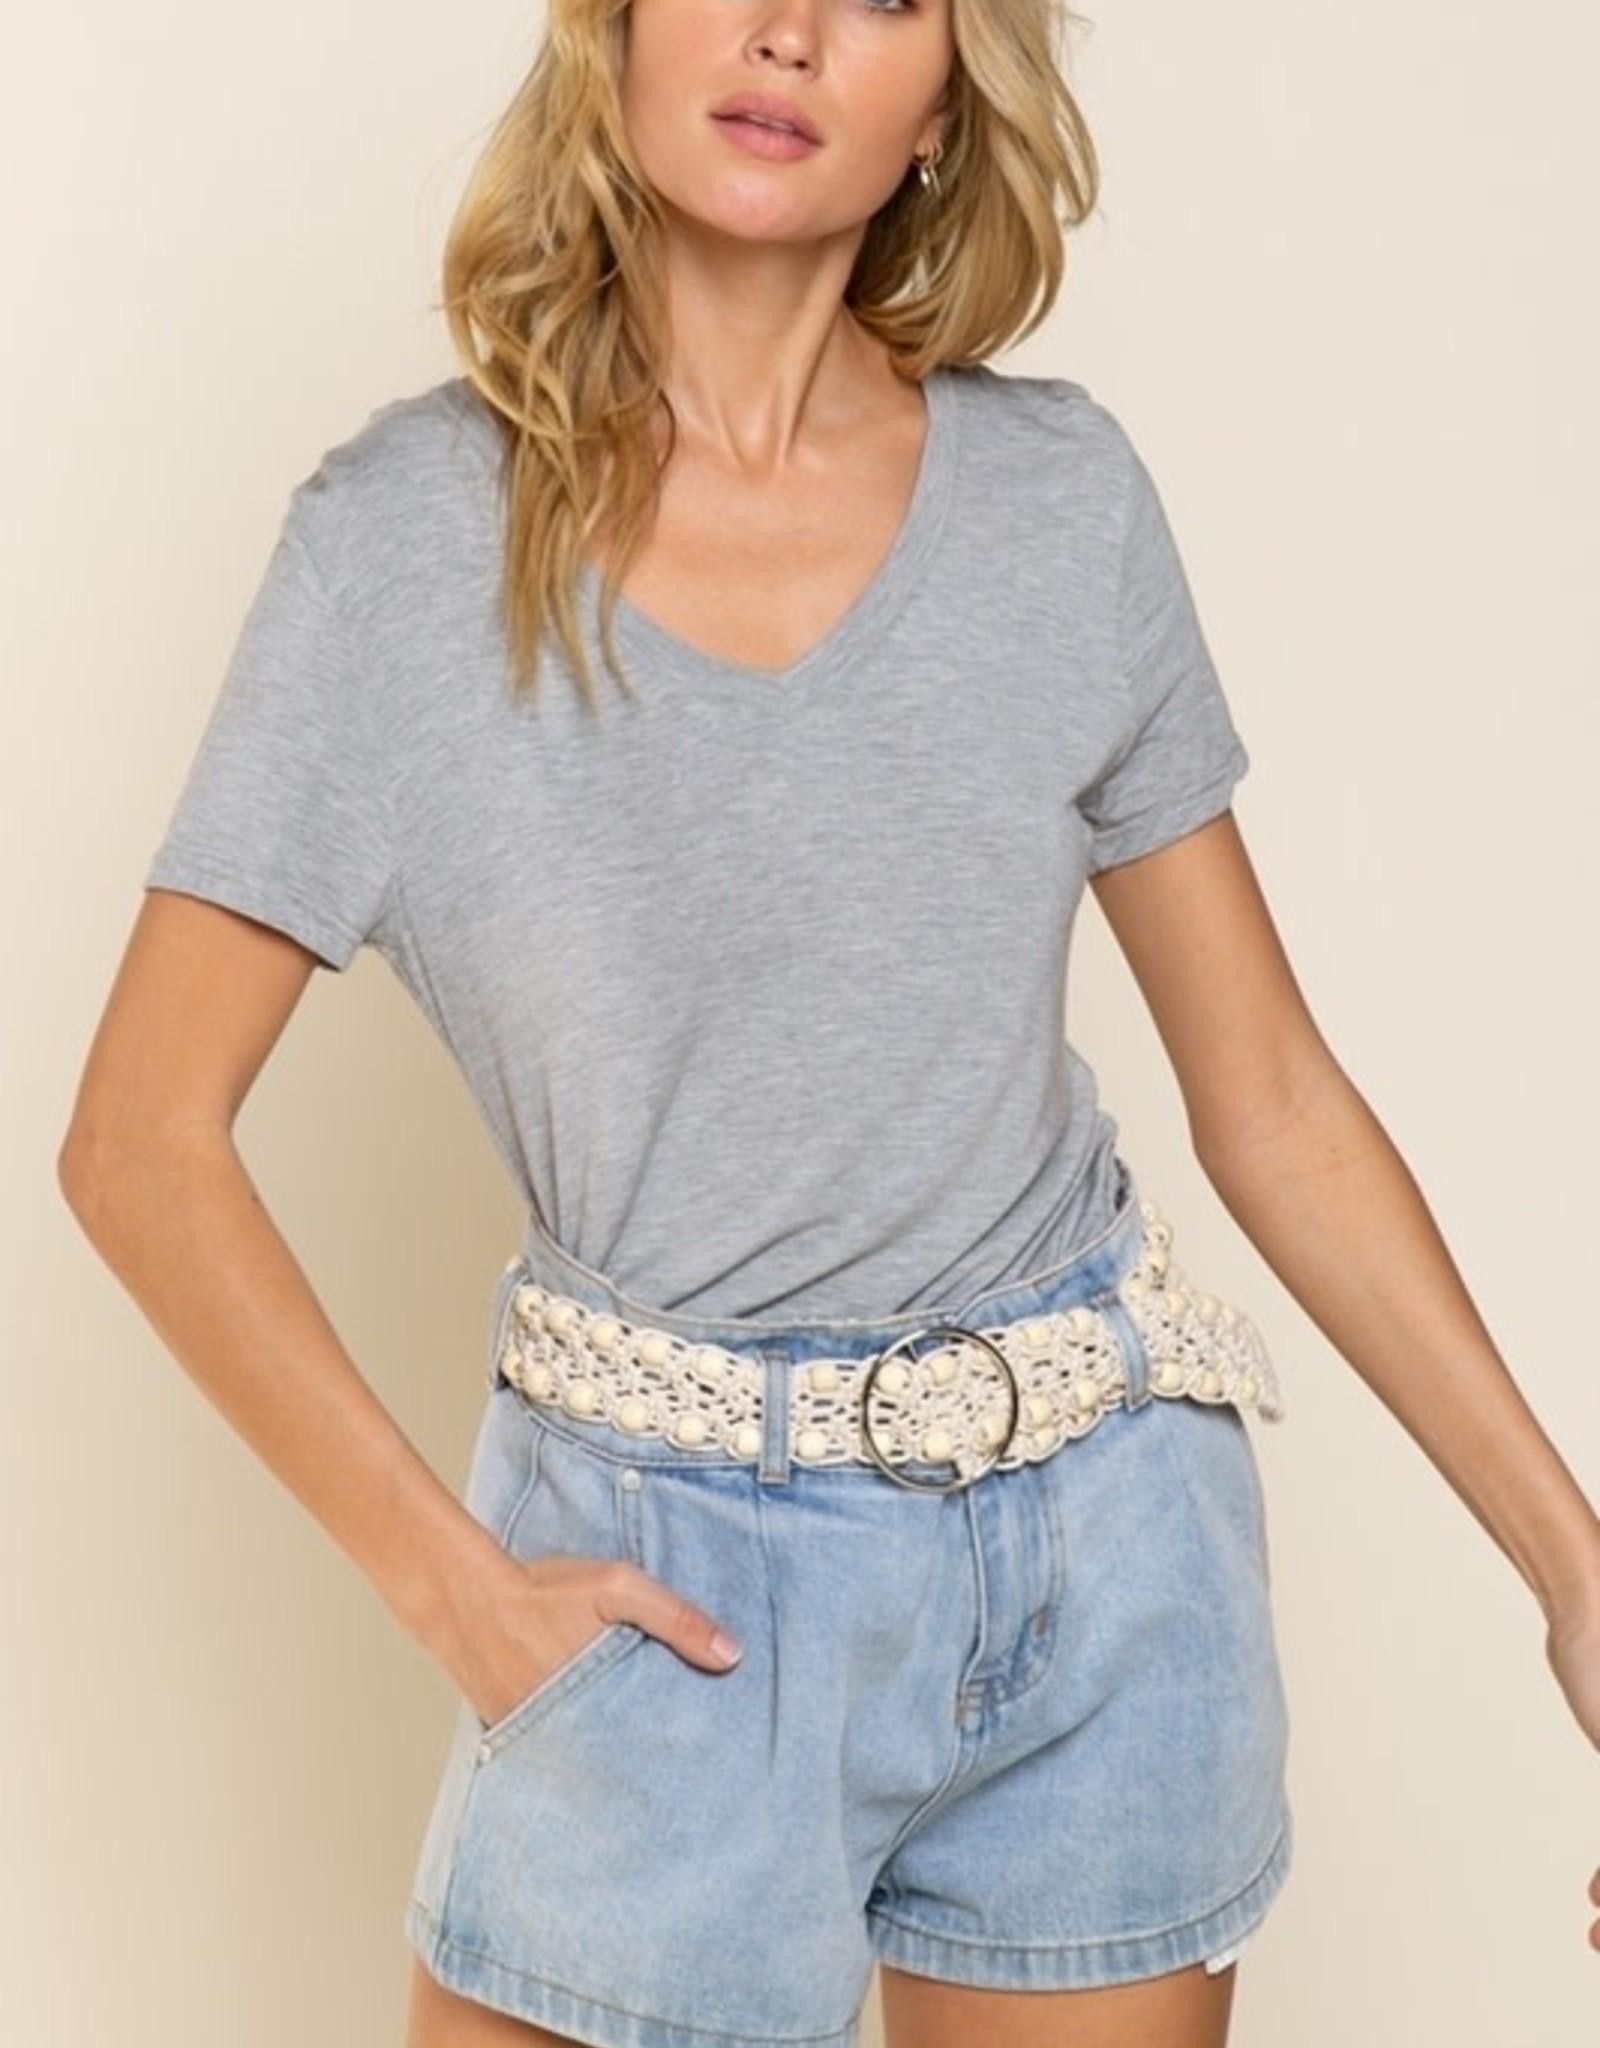 POL Clothing Classic Knit V Neck Top